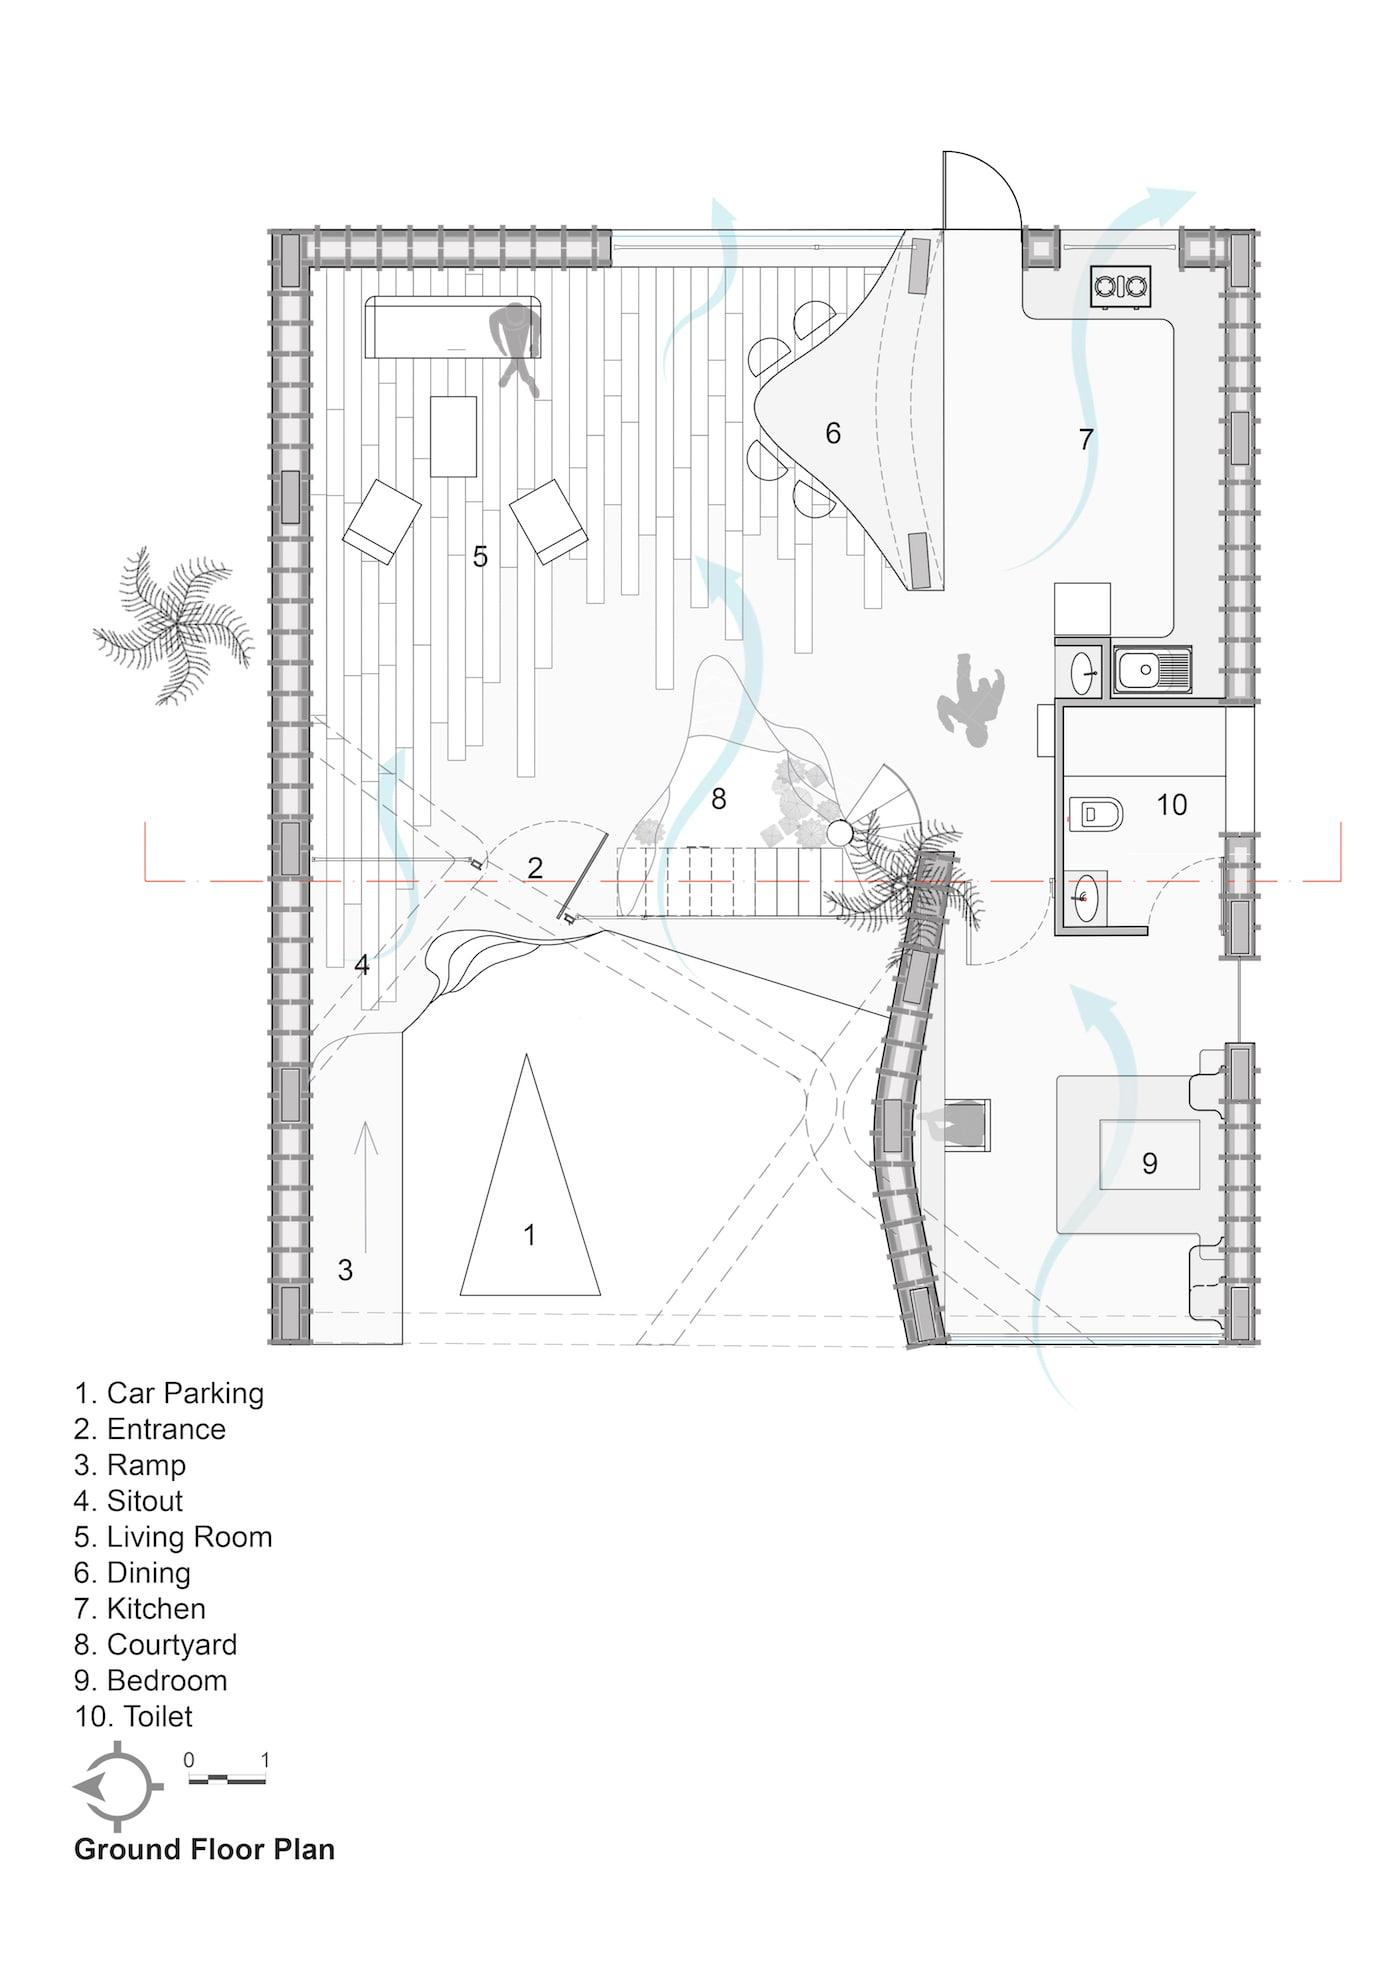 Wallmakers Pirouette House ground floor plan